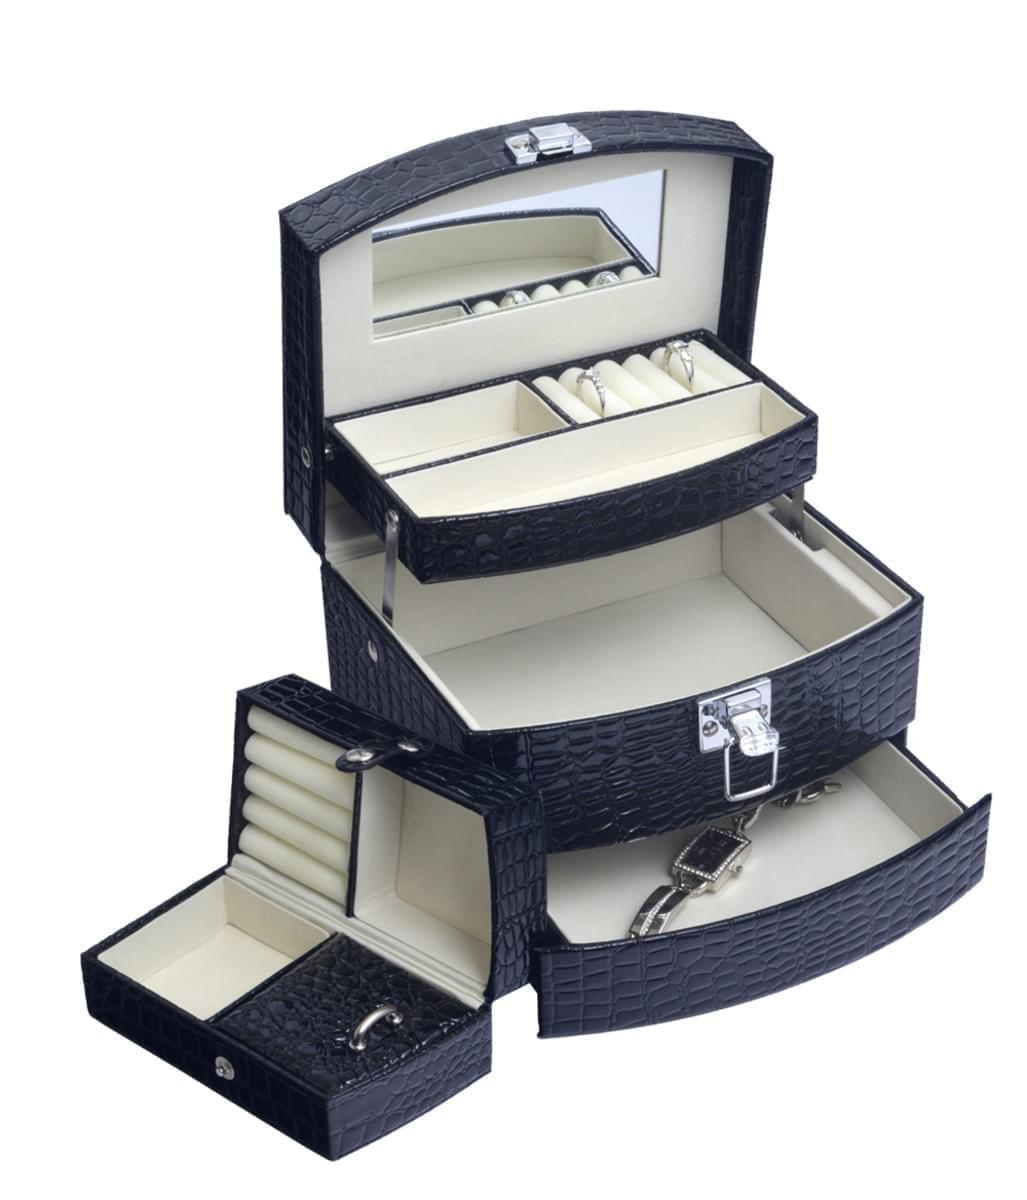 Šperkovnice SP250-A25N E-batoh